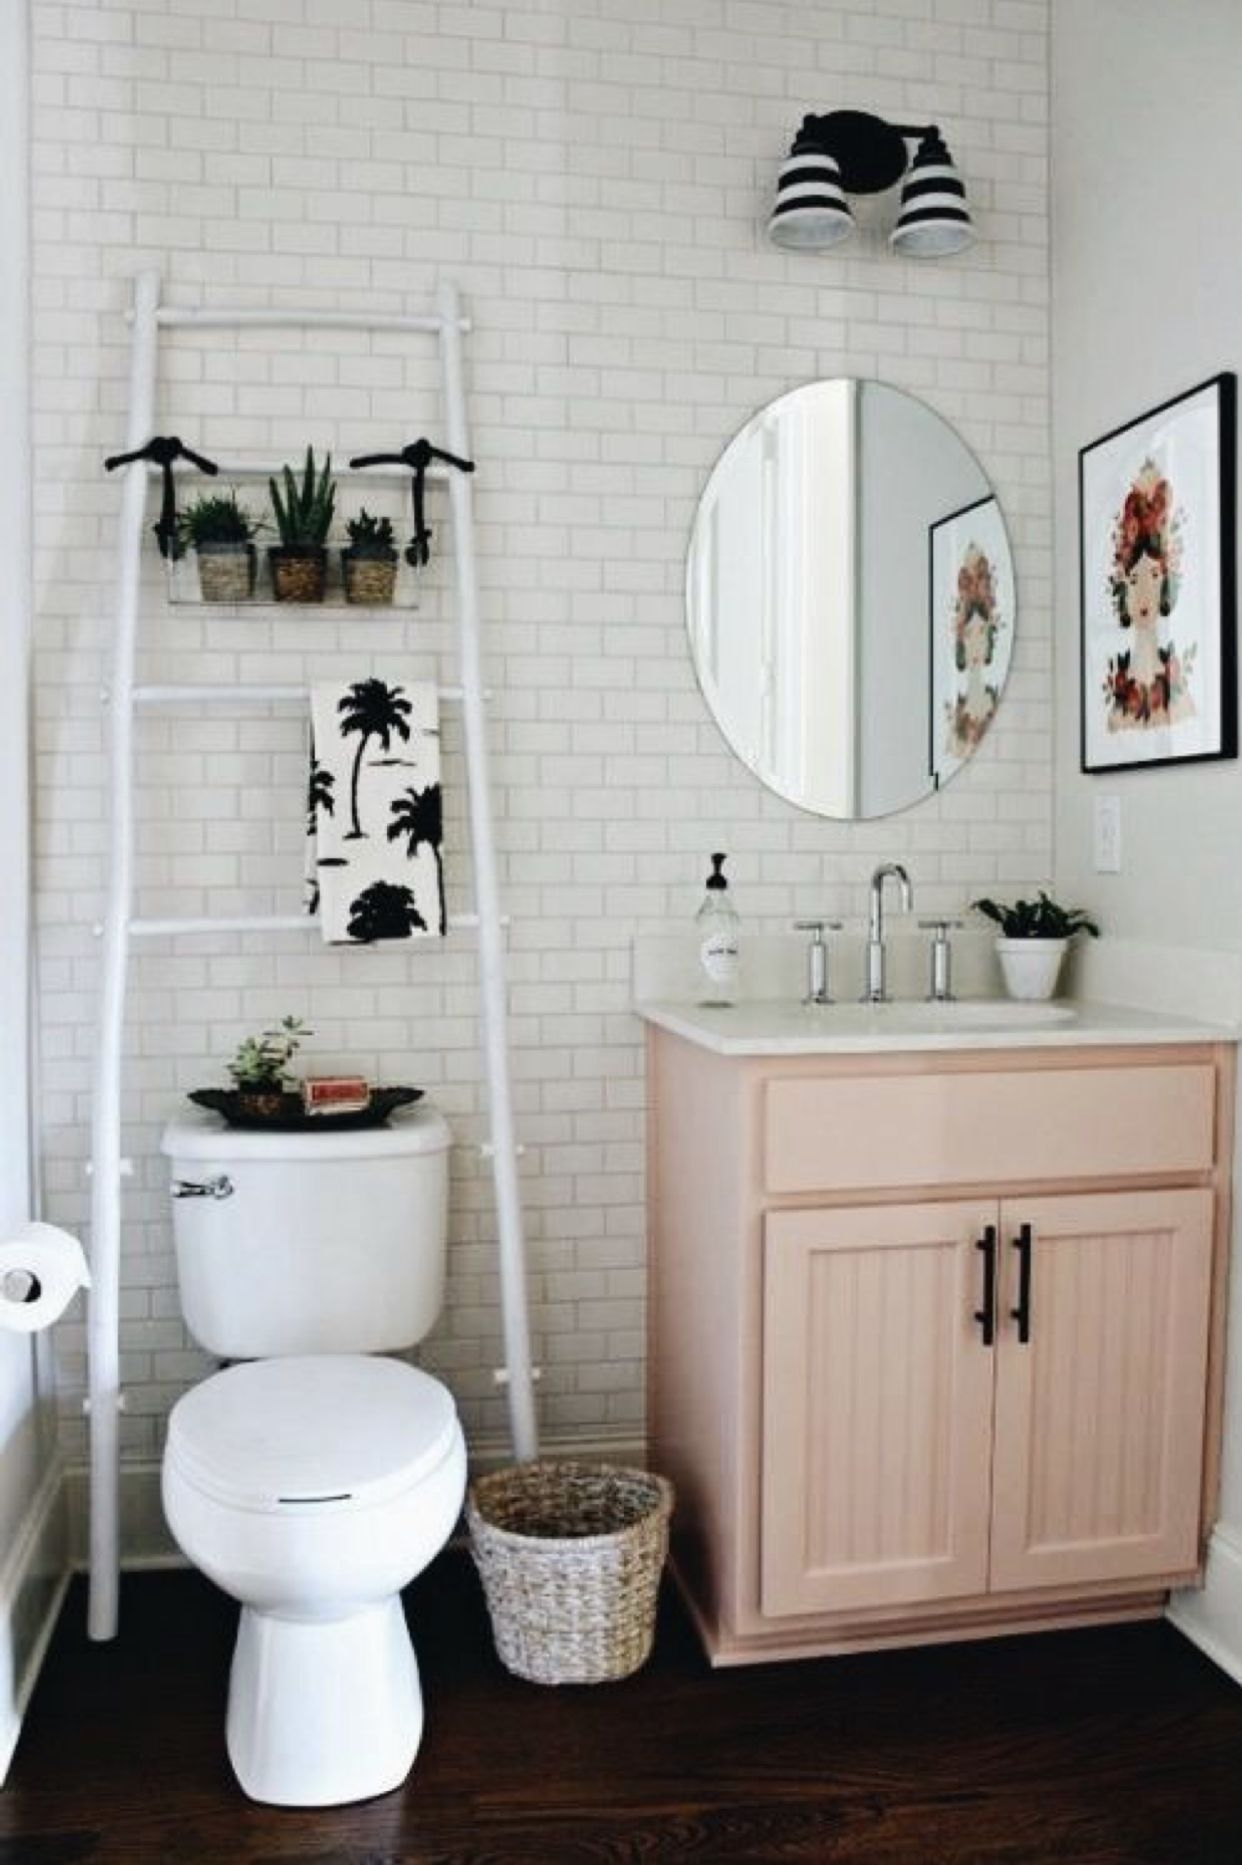 Pinterest Iѕavyeℓℓa ℓiaig Small Bathroom Diy Bathroom Bathroom Decor